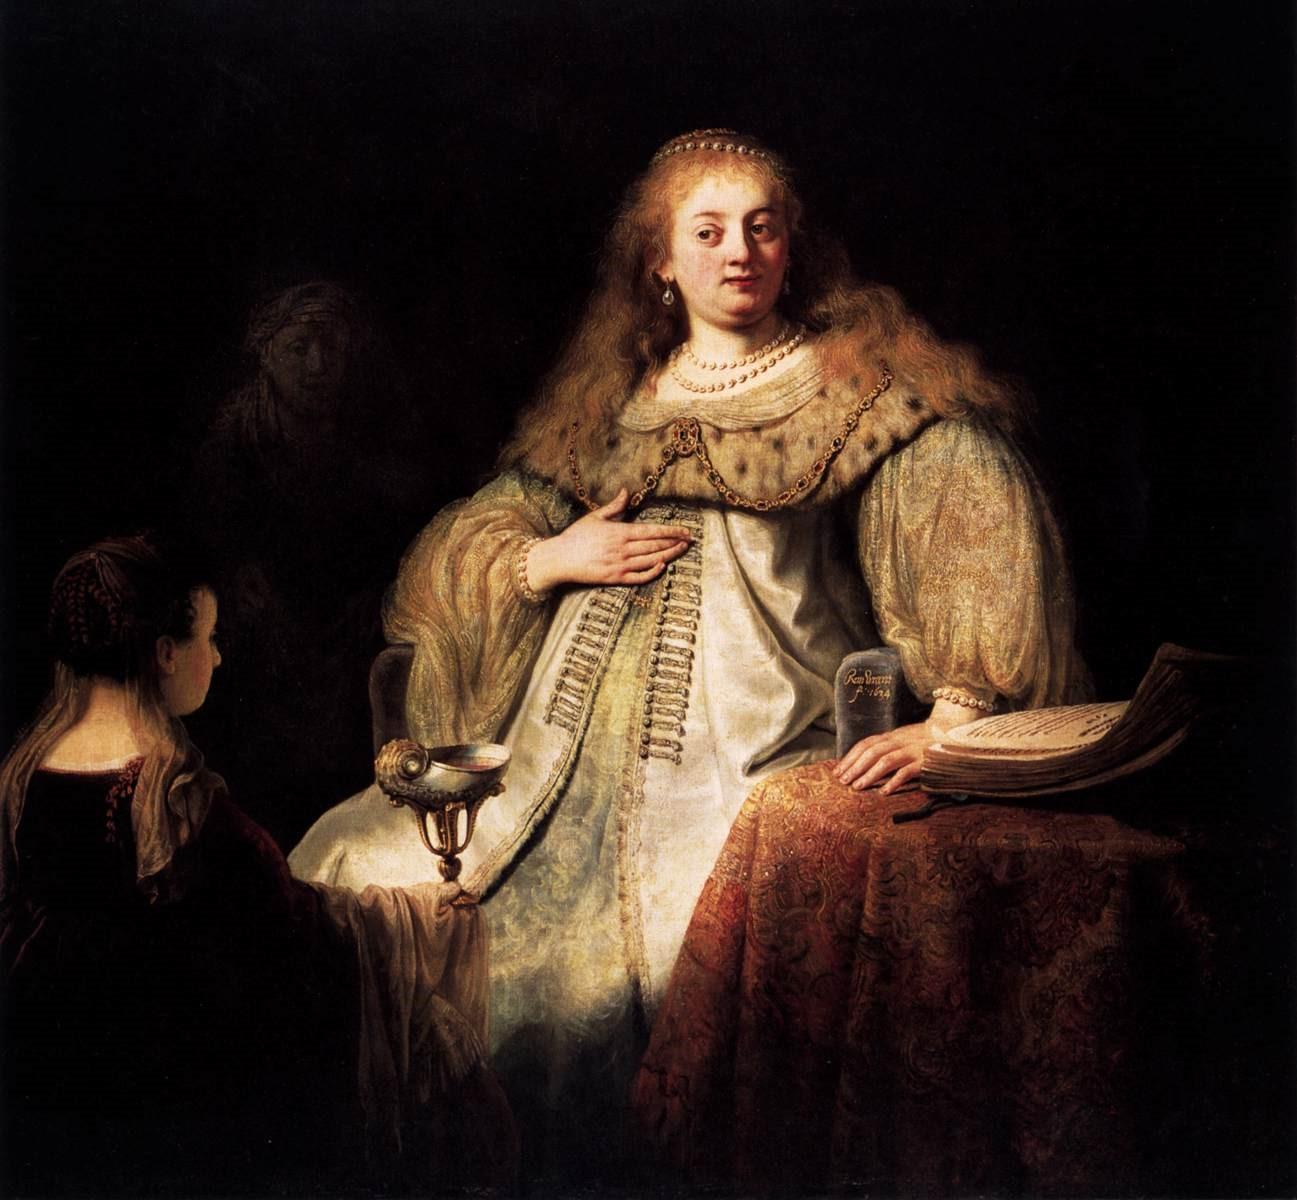 Rembrandt's Masterpieces